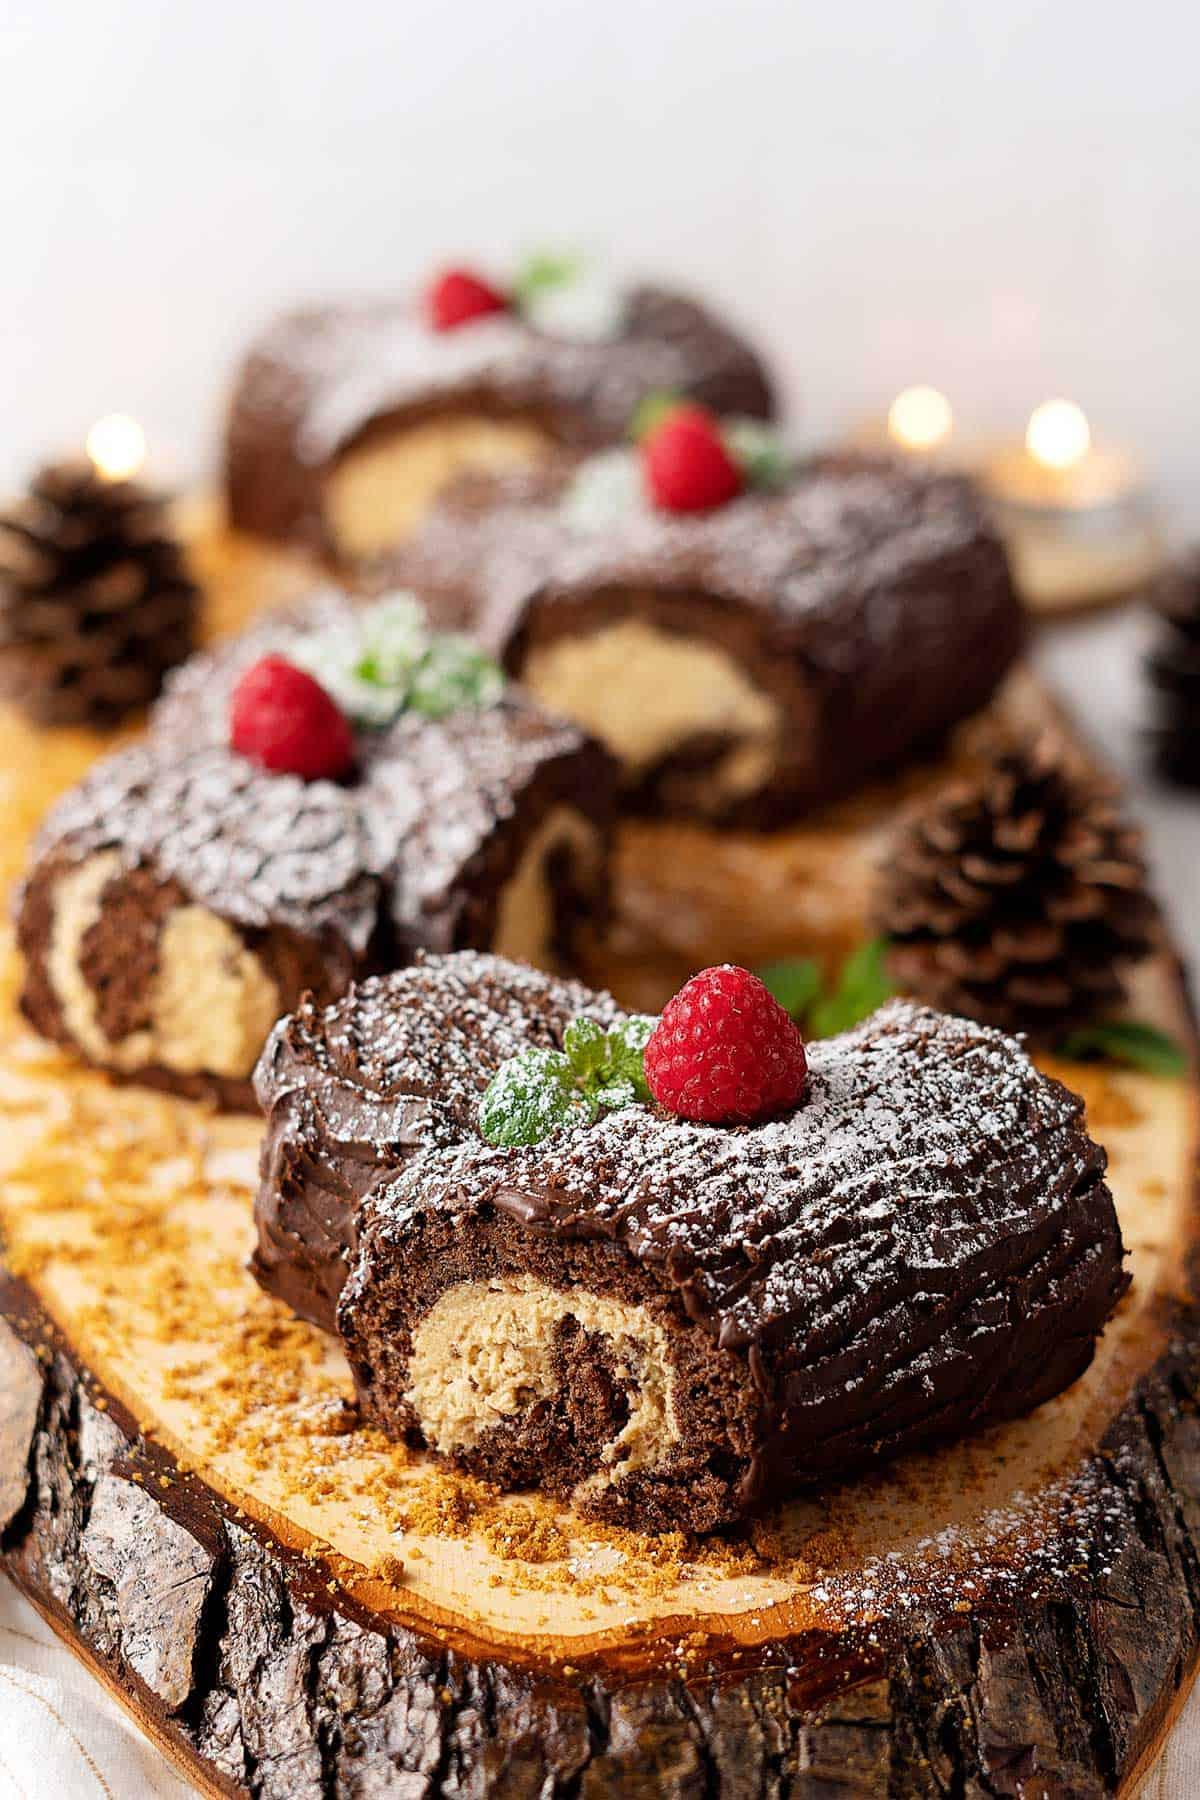 Four Mini Bûche de Noël on a log serving tray.